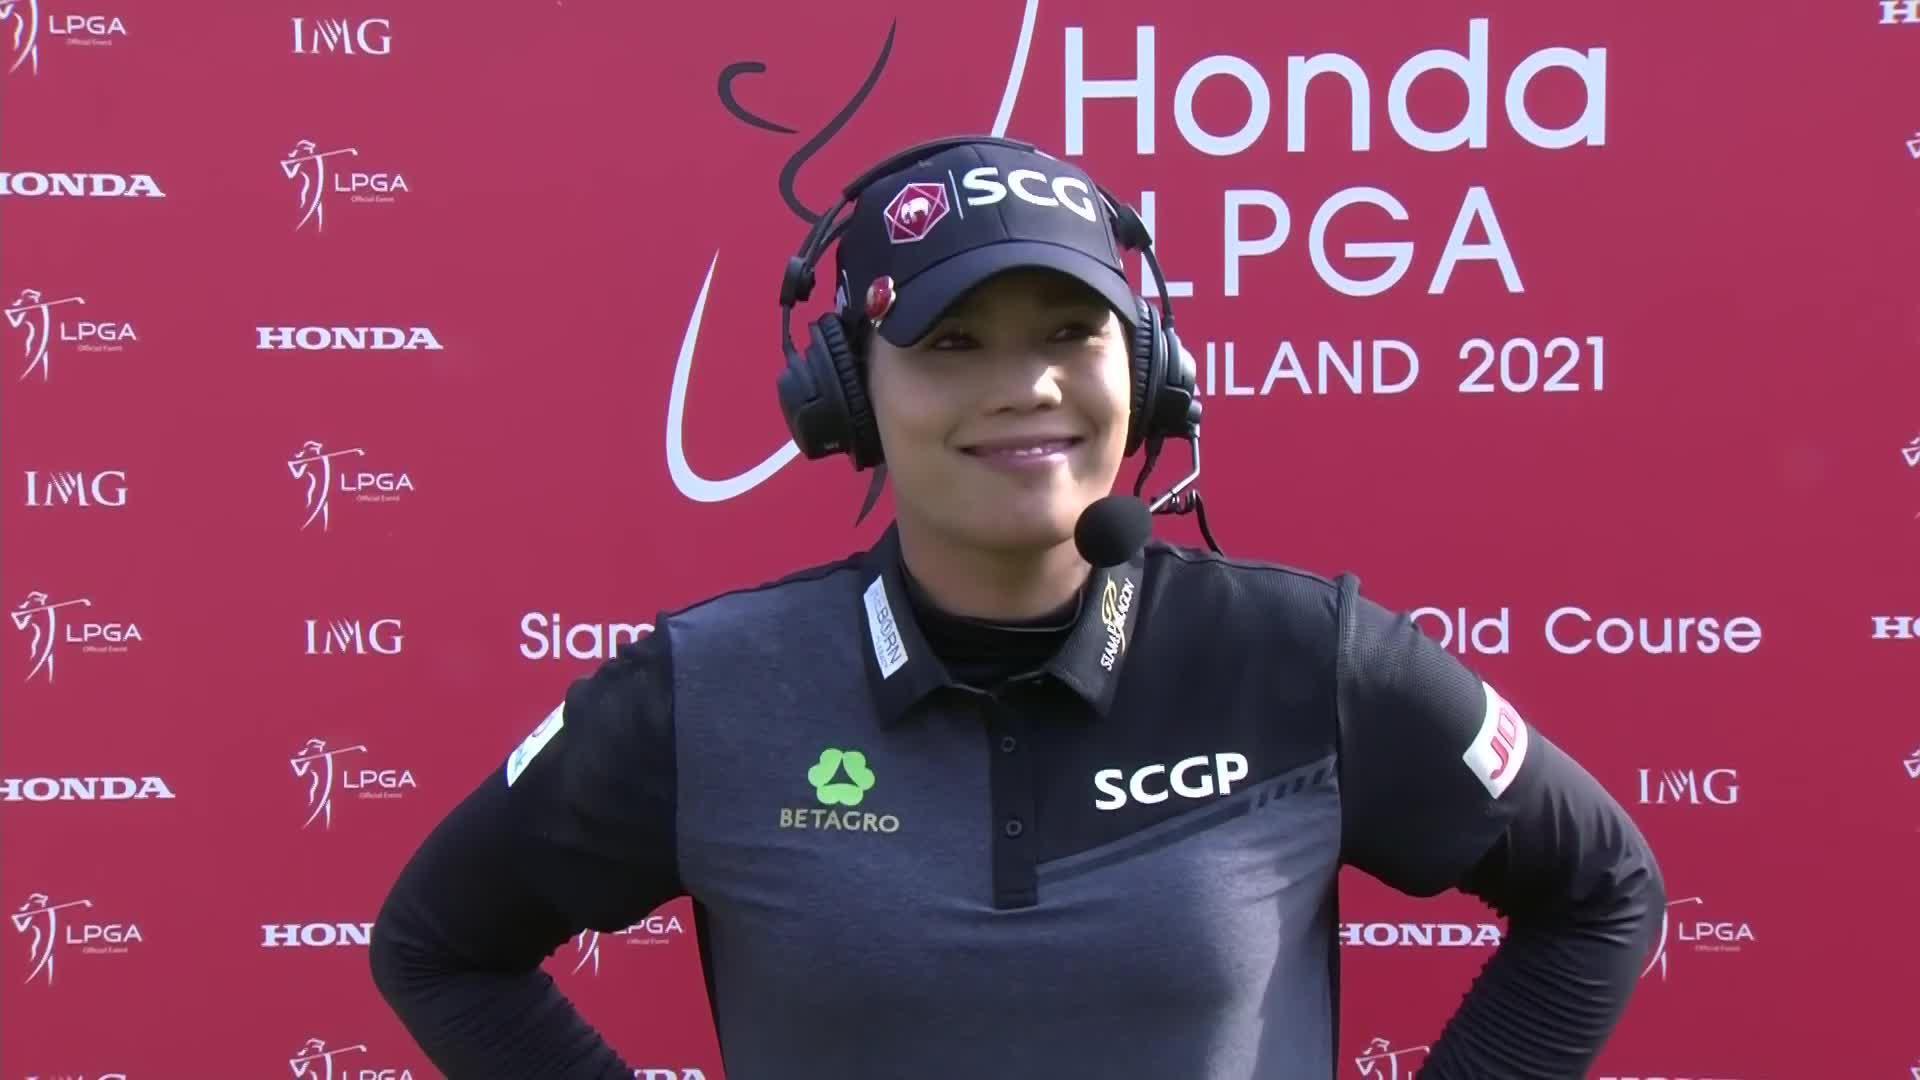 Ariya Jutanugarn Final Round Interview at the 2021 Honda LPGA Thailand